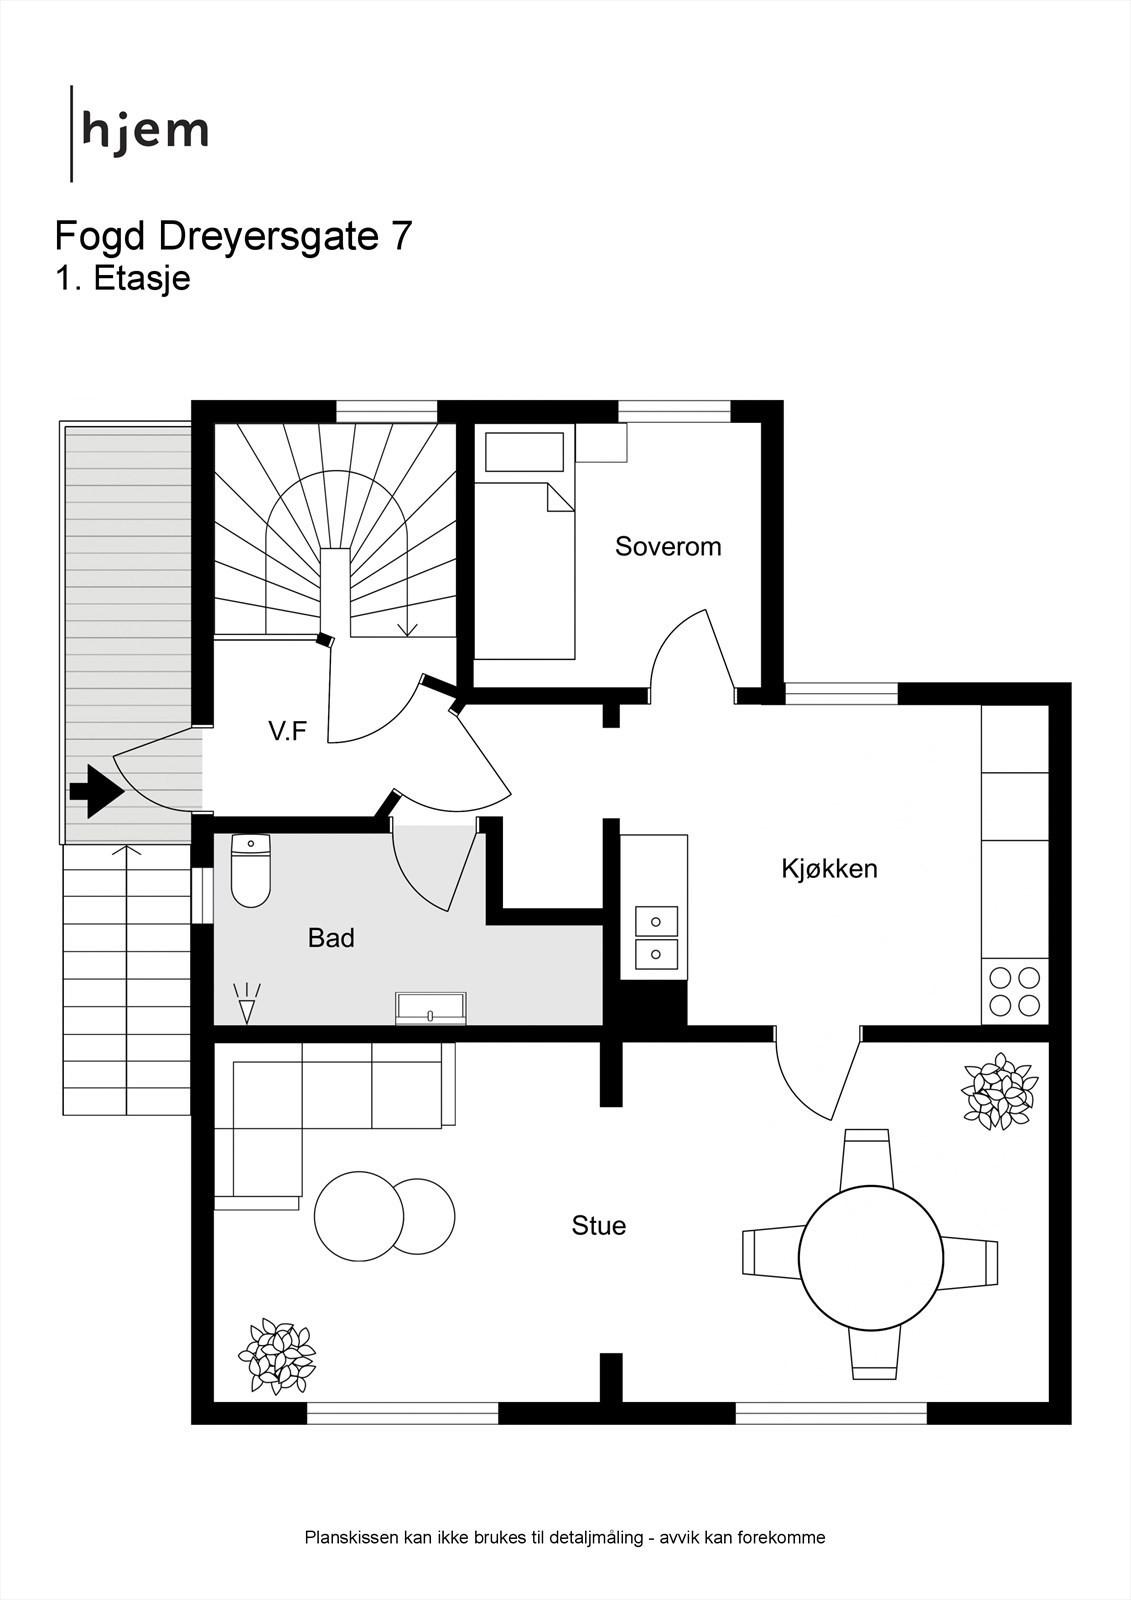 Fogd Dreyersgate 7 - 2D - 1. Etasje